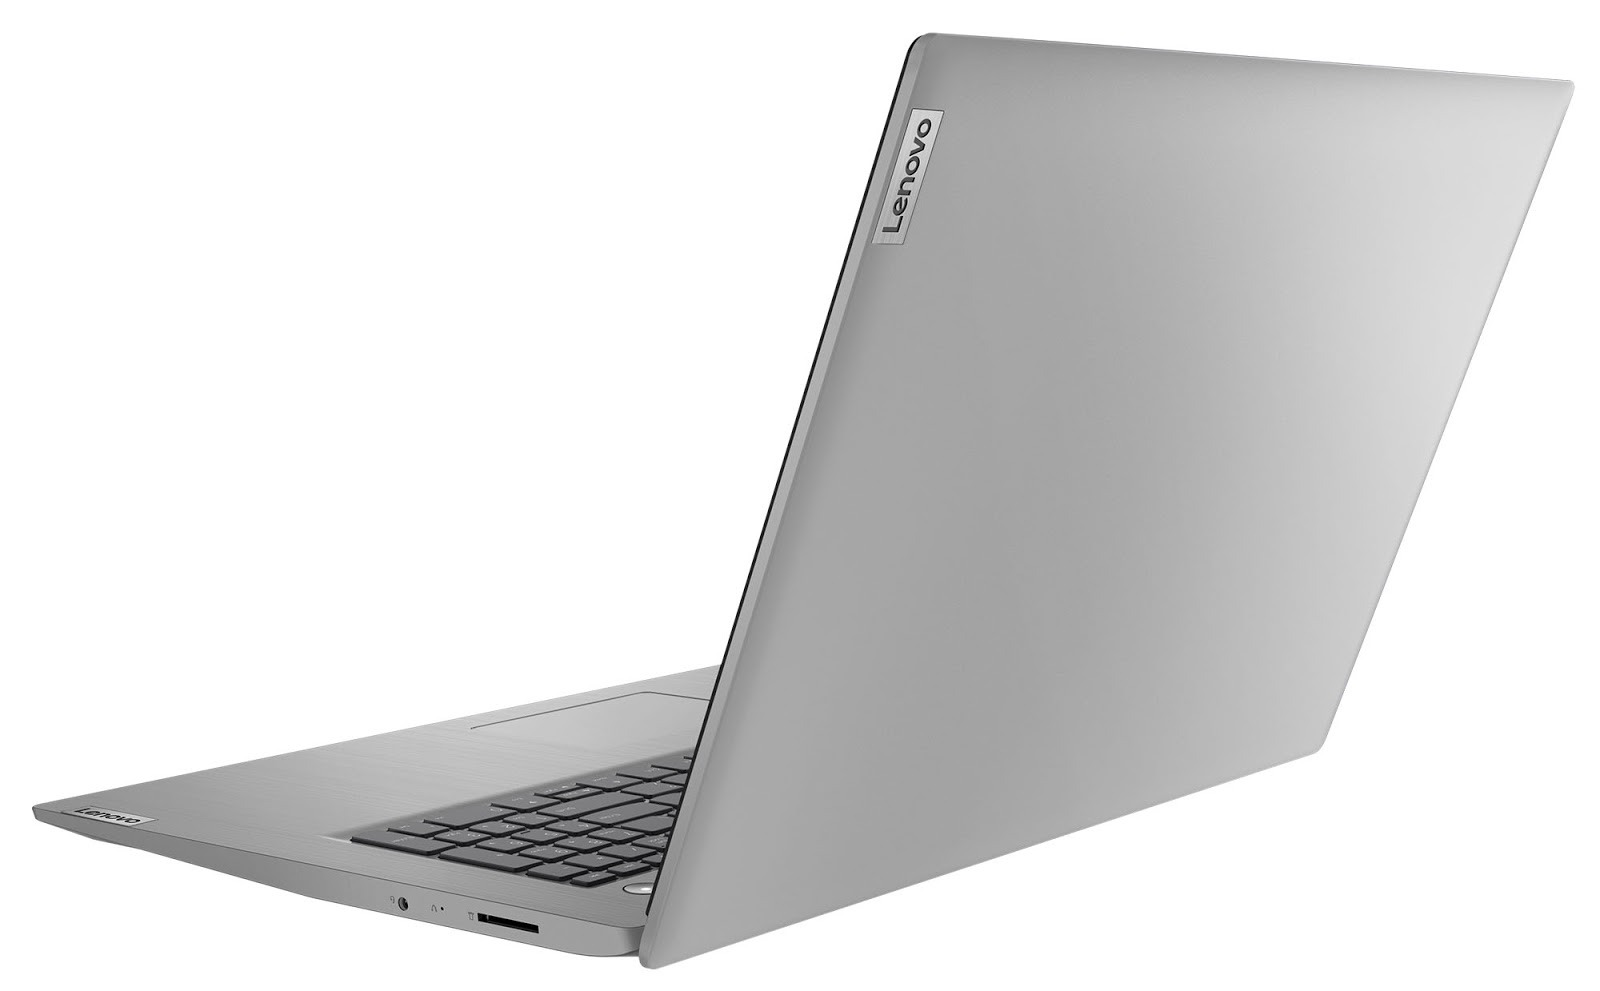 Фото 1. Ноутбук Lenovo ideapad 3 17ADA05 Platinum Grey (81W20042RE)